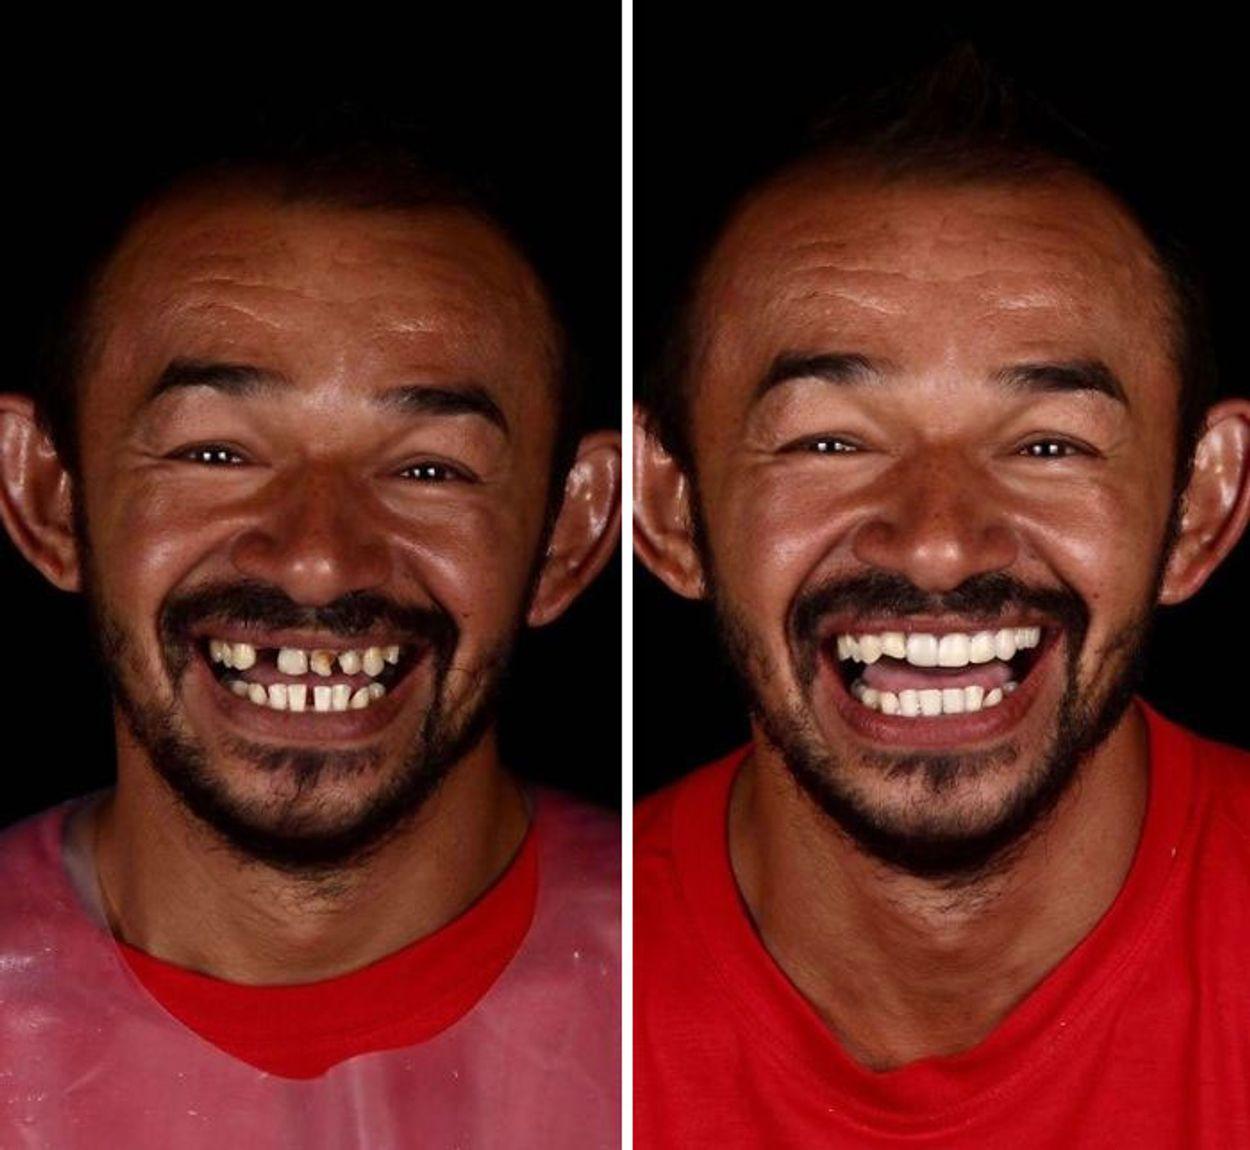 brazilian-dentist-travel-poor-people-teeth-fix-felipe-rossi-34-5db94fcb2d758__700